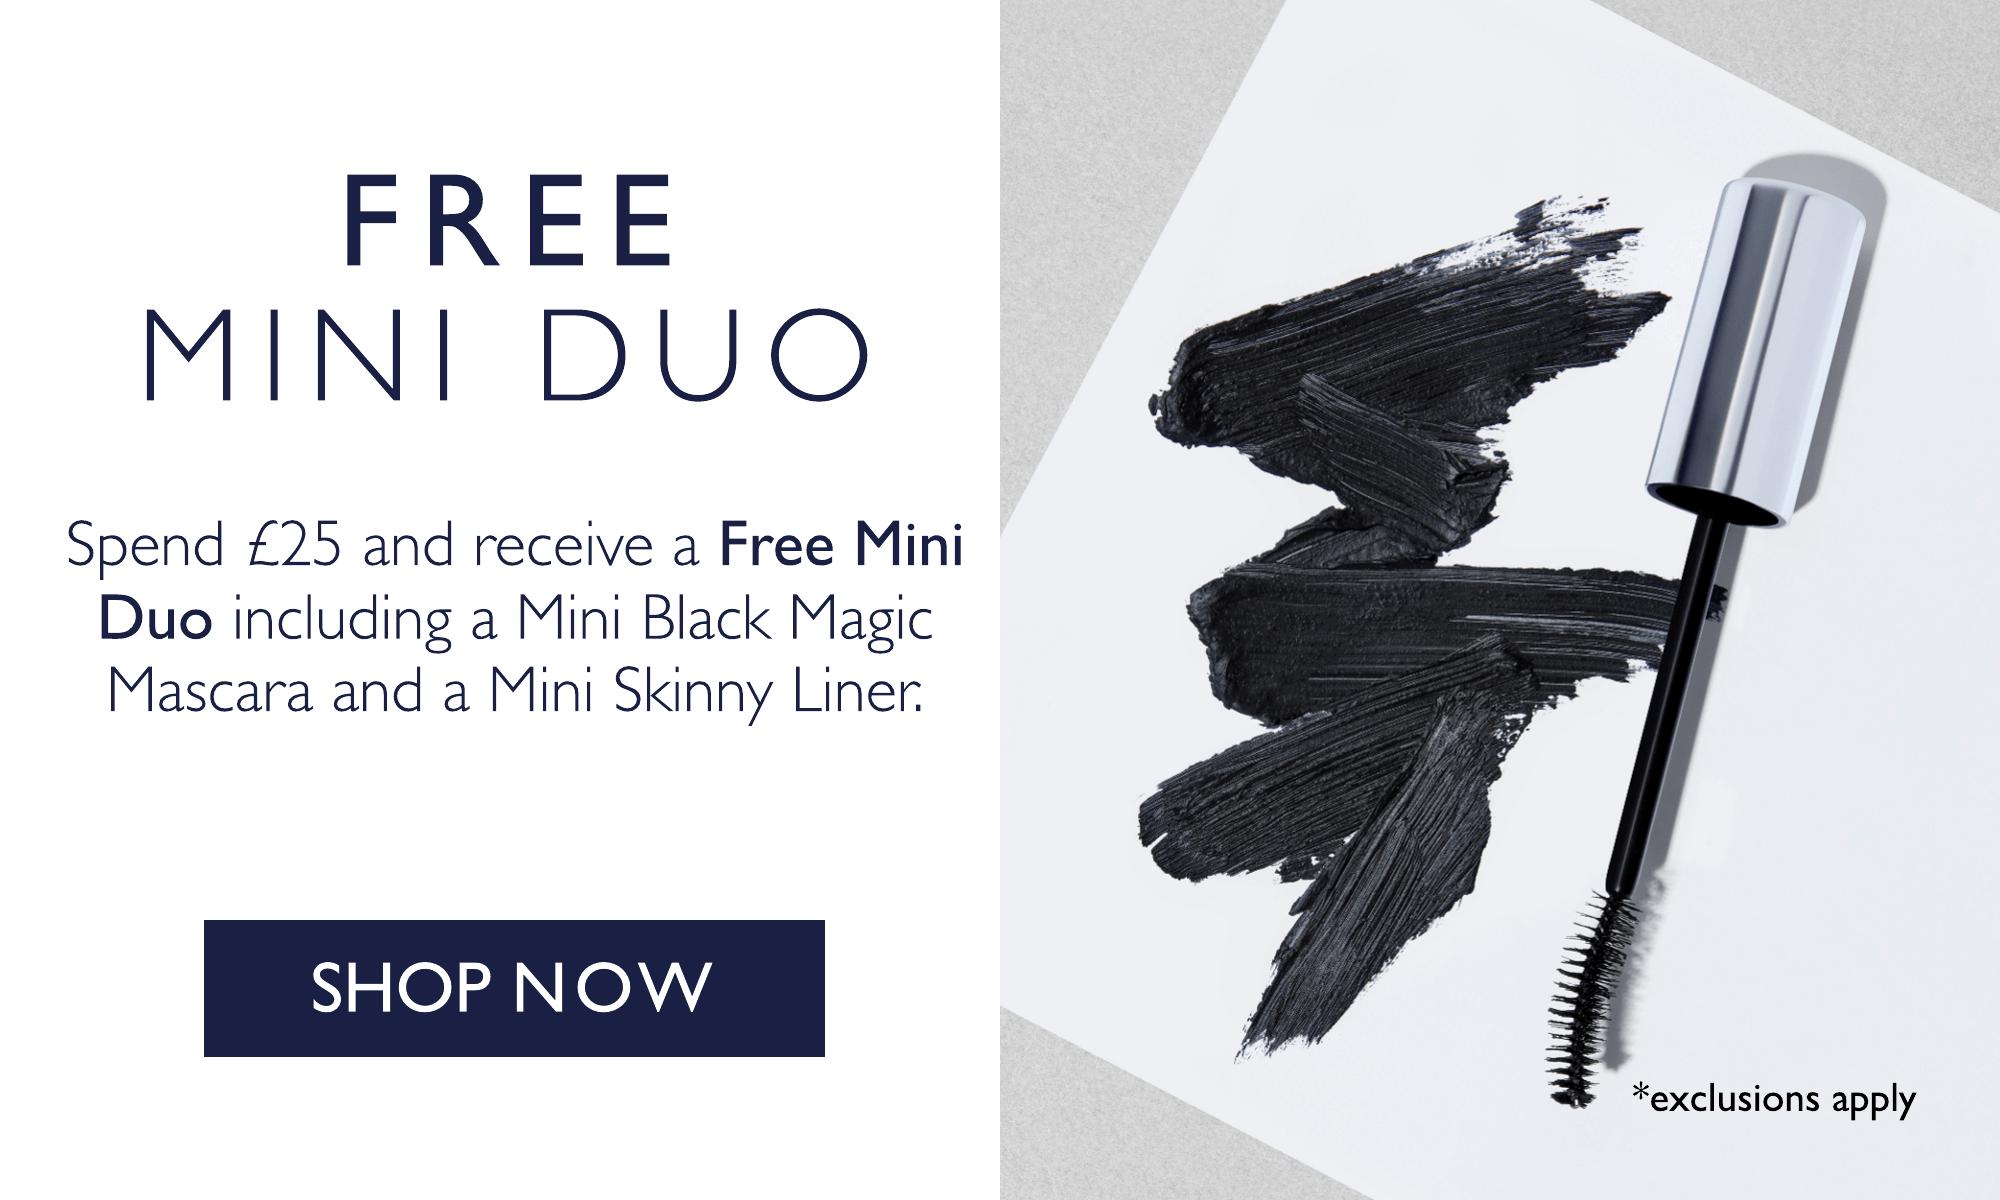 Receive a free Mini Duo when you spend £25